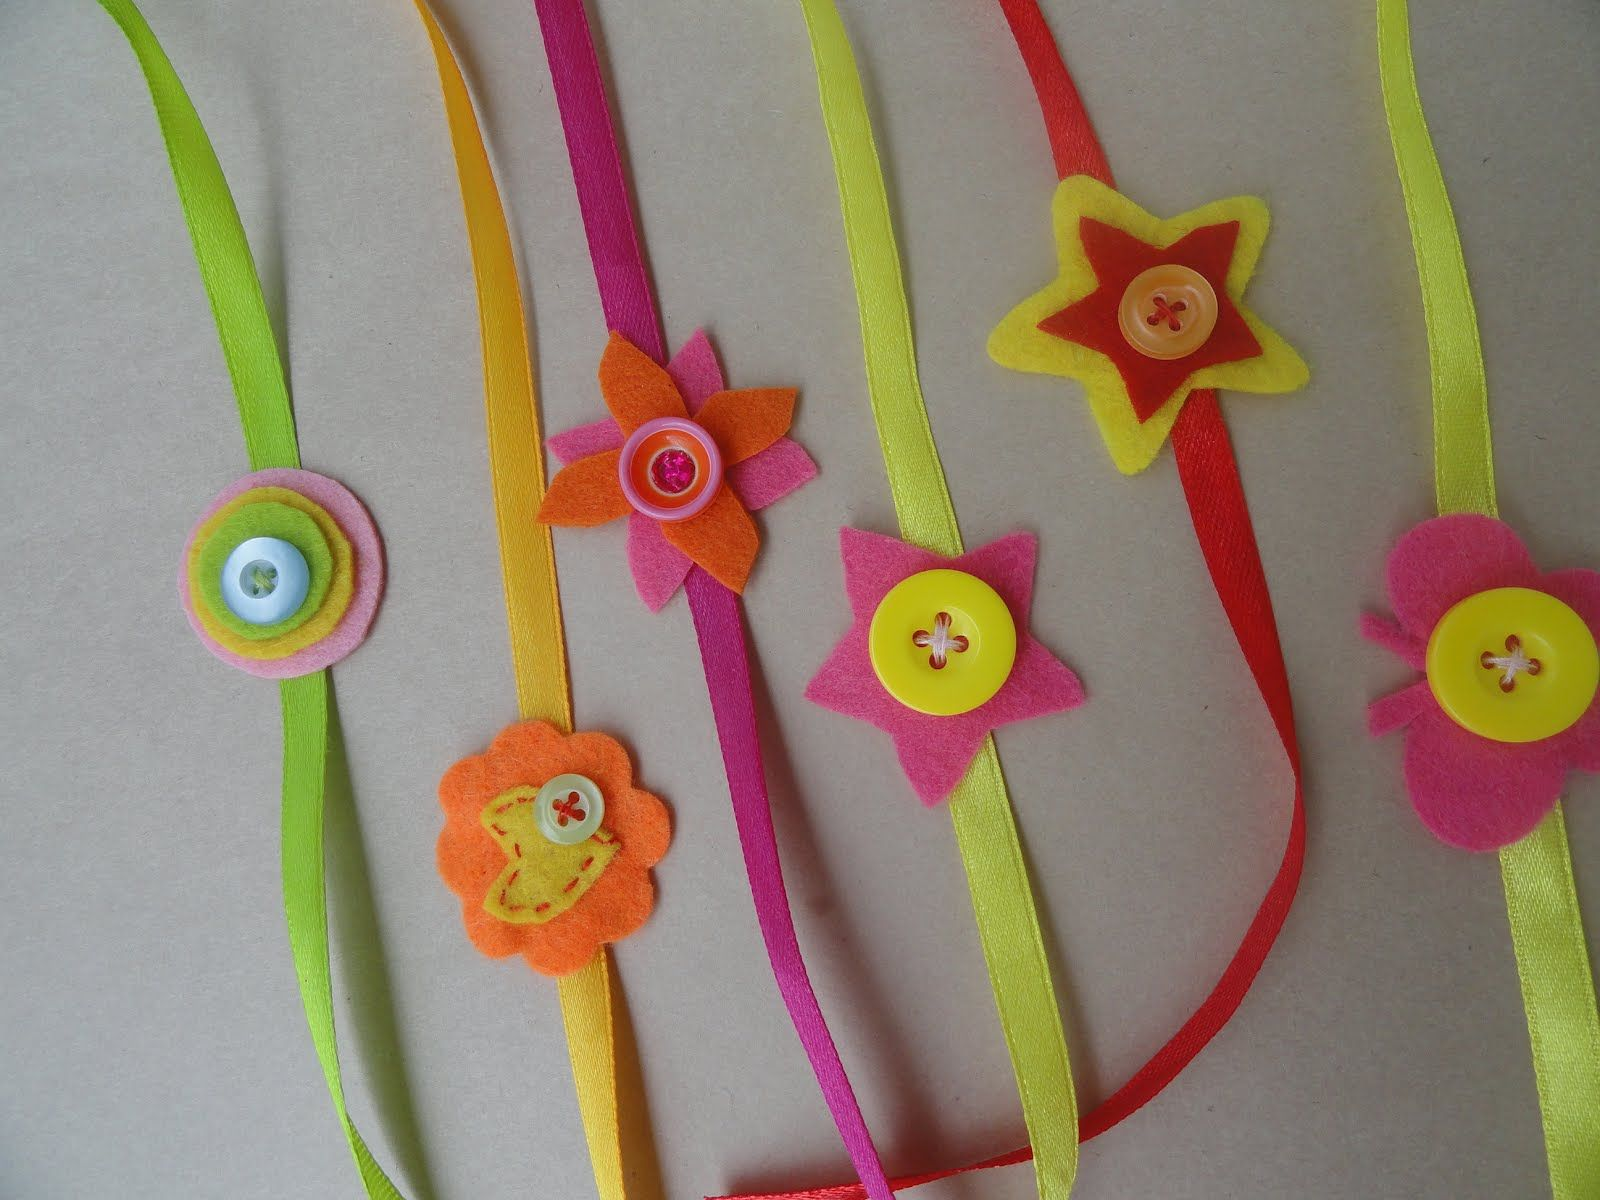 Happy raksha bandhan mommies homemade rakhies for kids fun craft kristyandbryce Gallery